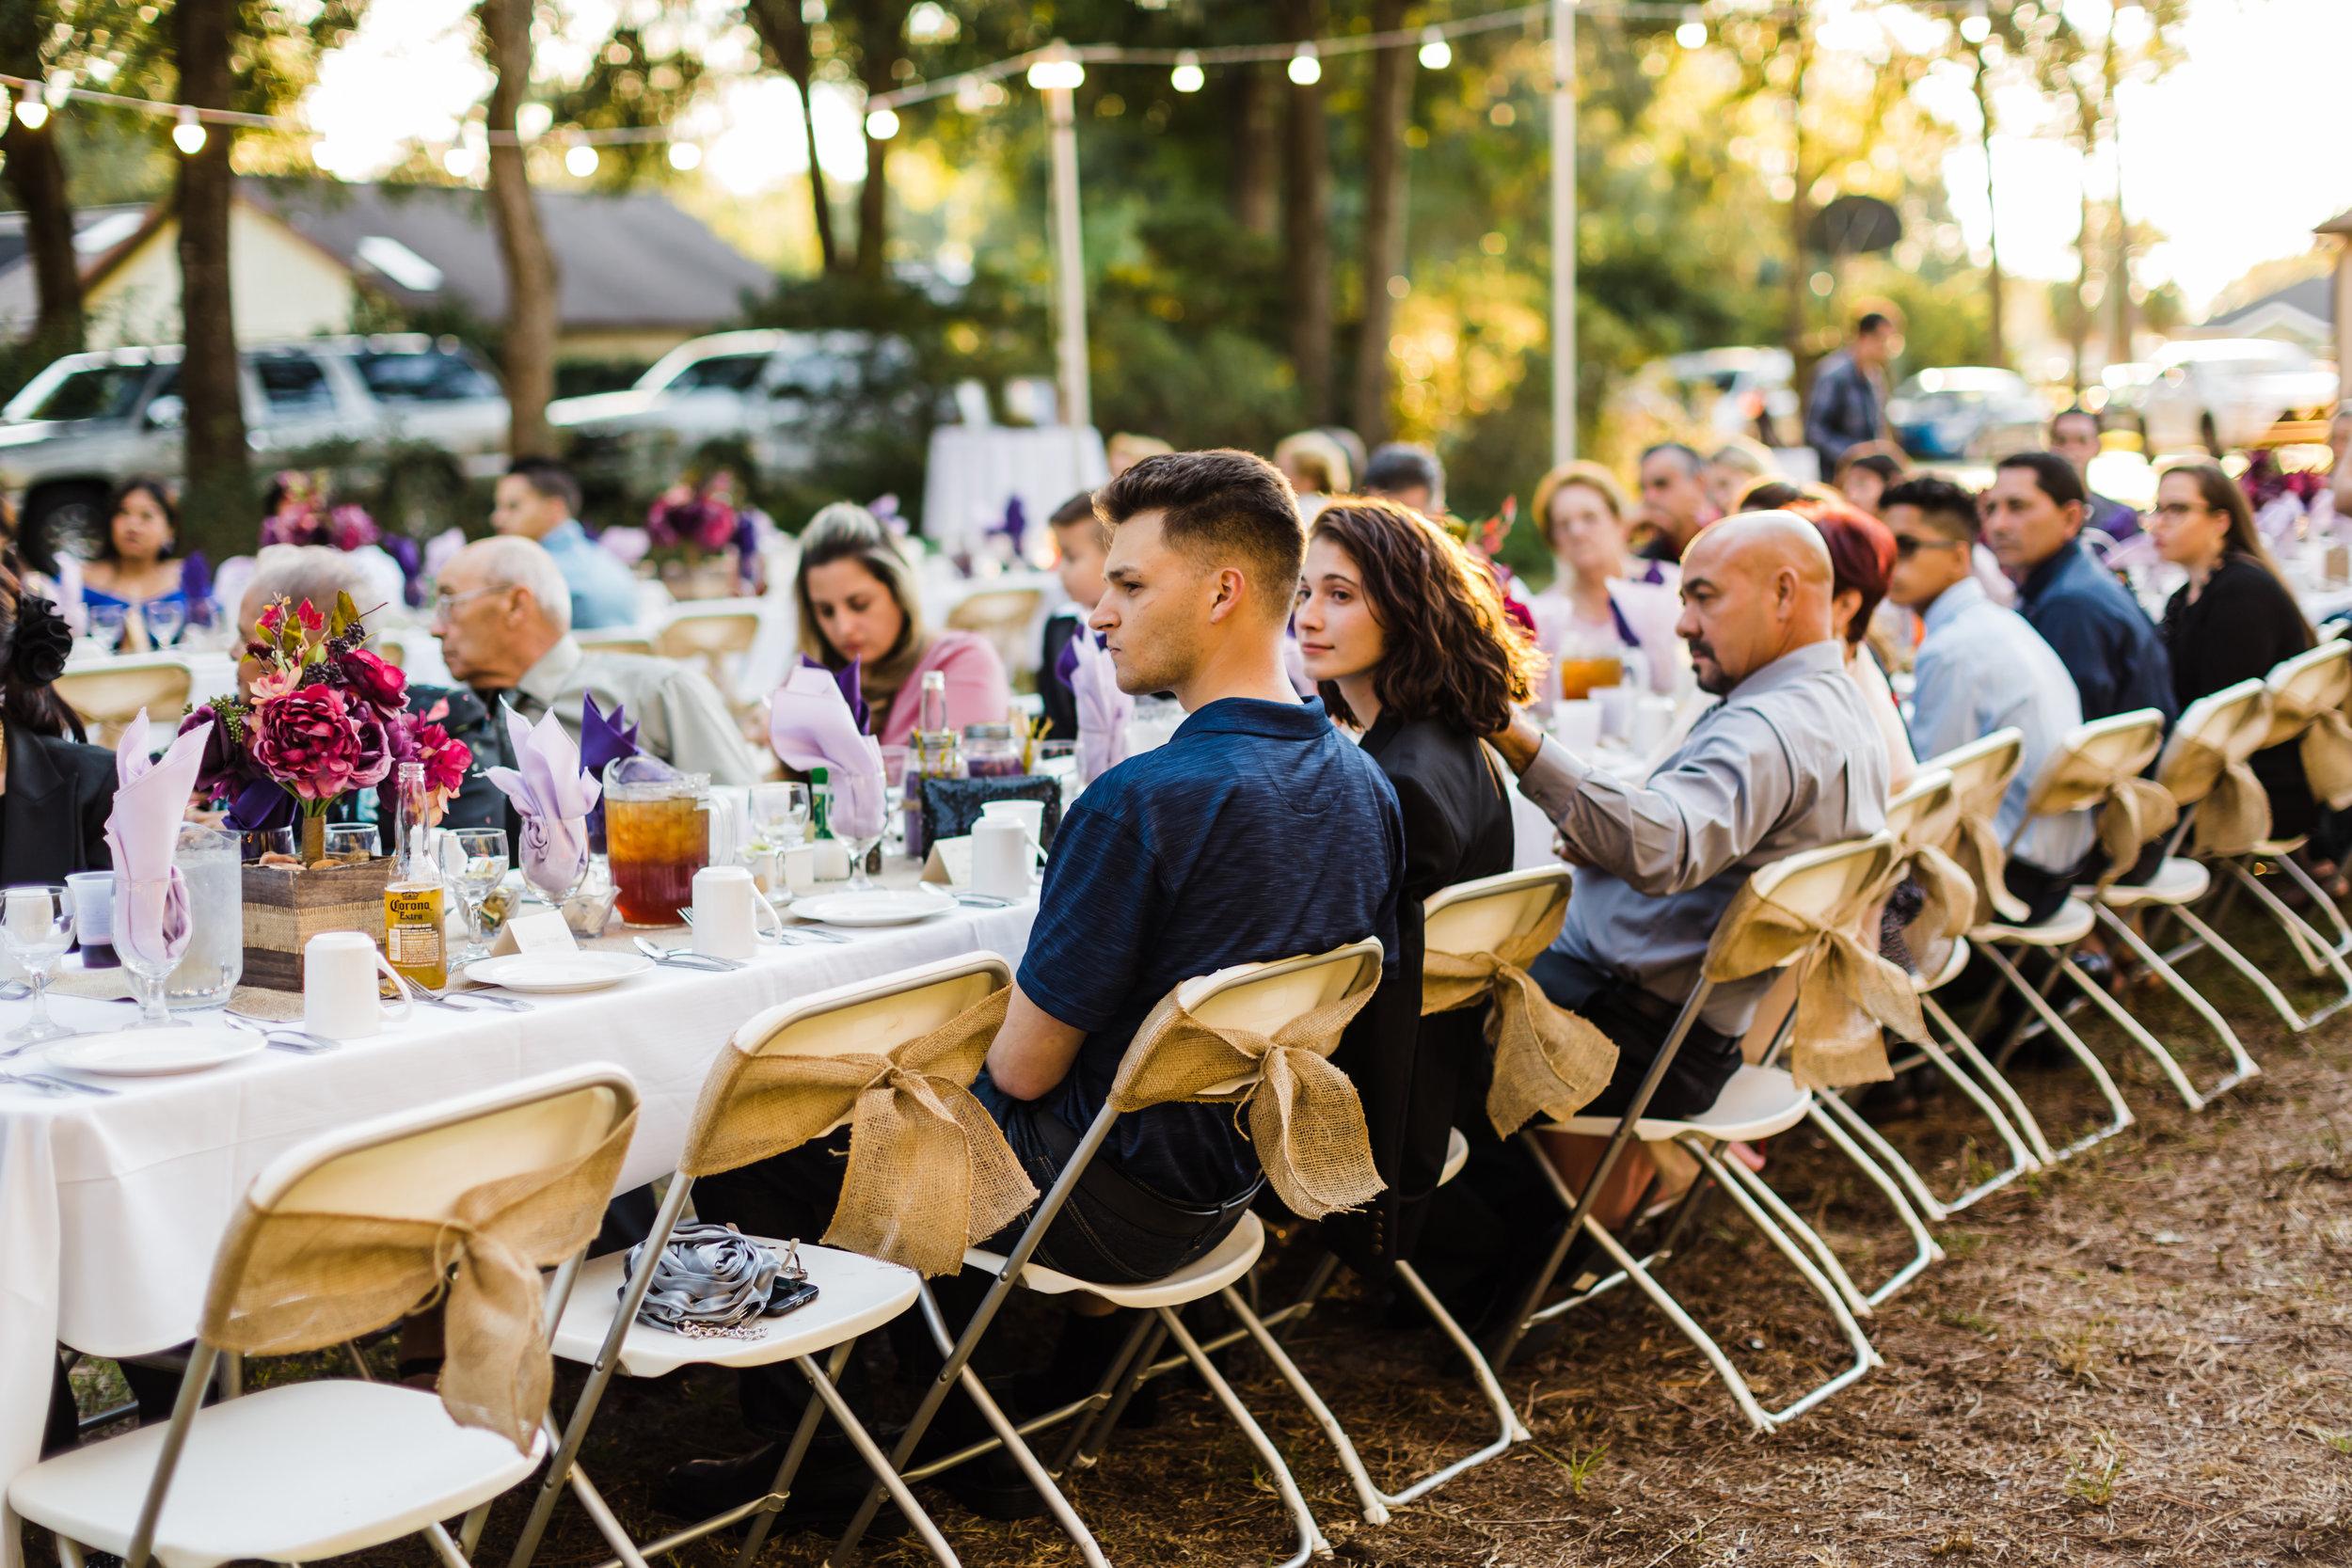 2018.11.03 Jael and Edel Ocala Wedding FINALS (207 of 441).jpg